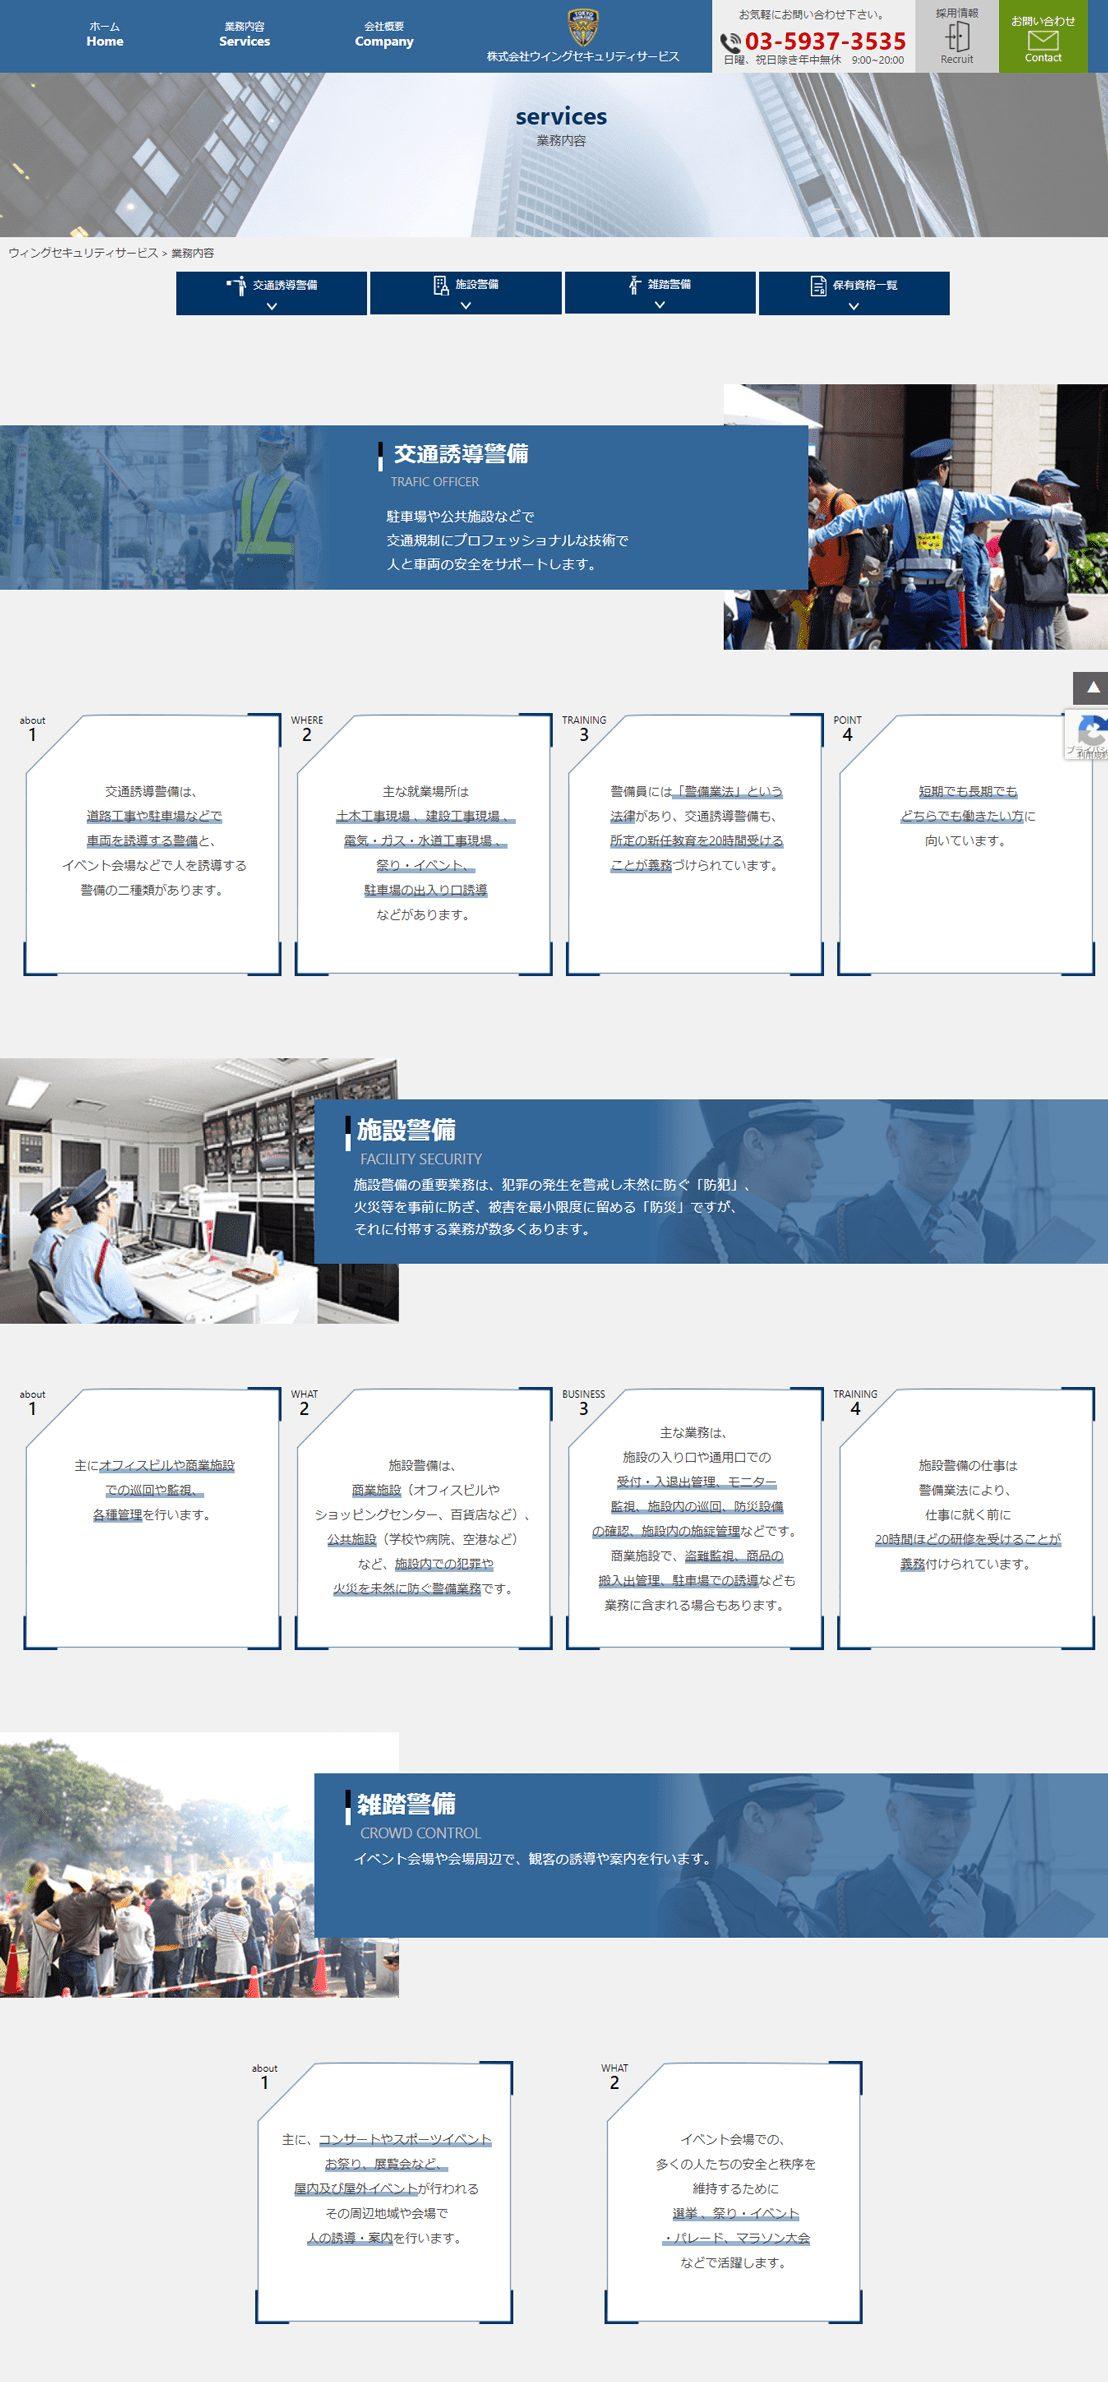 shinjuku-ss.com_services_-min